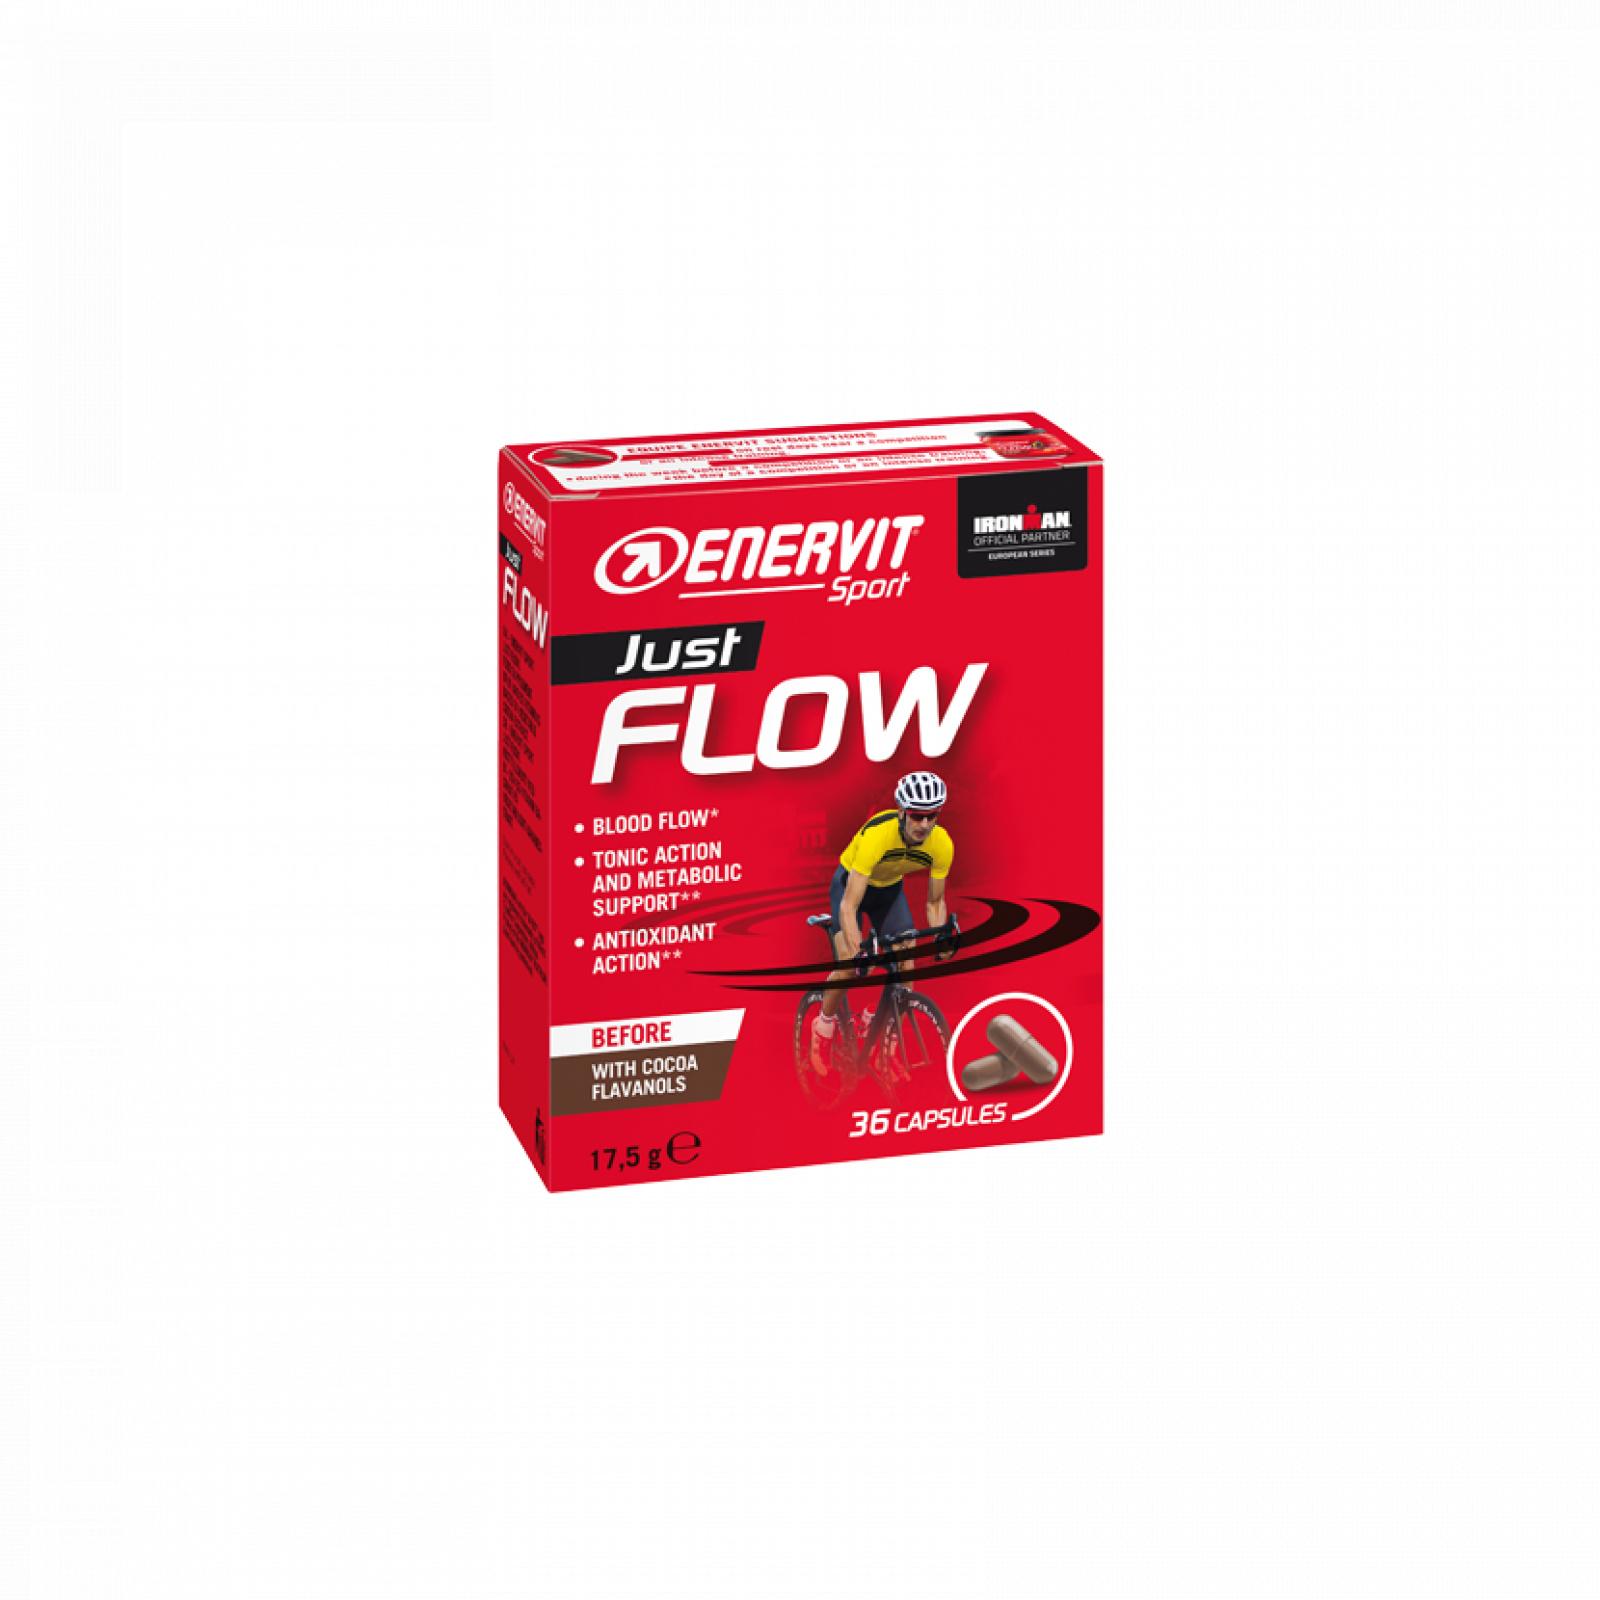 https://www.badec.store/produkty_img/enervit-just-flow1602782162L.png